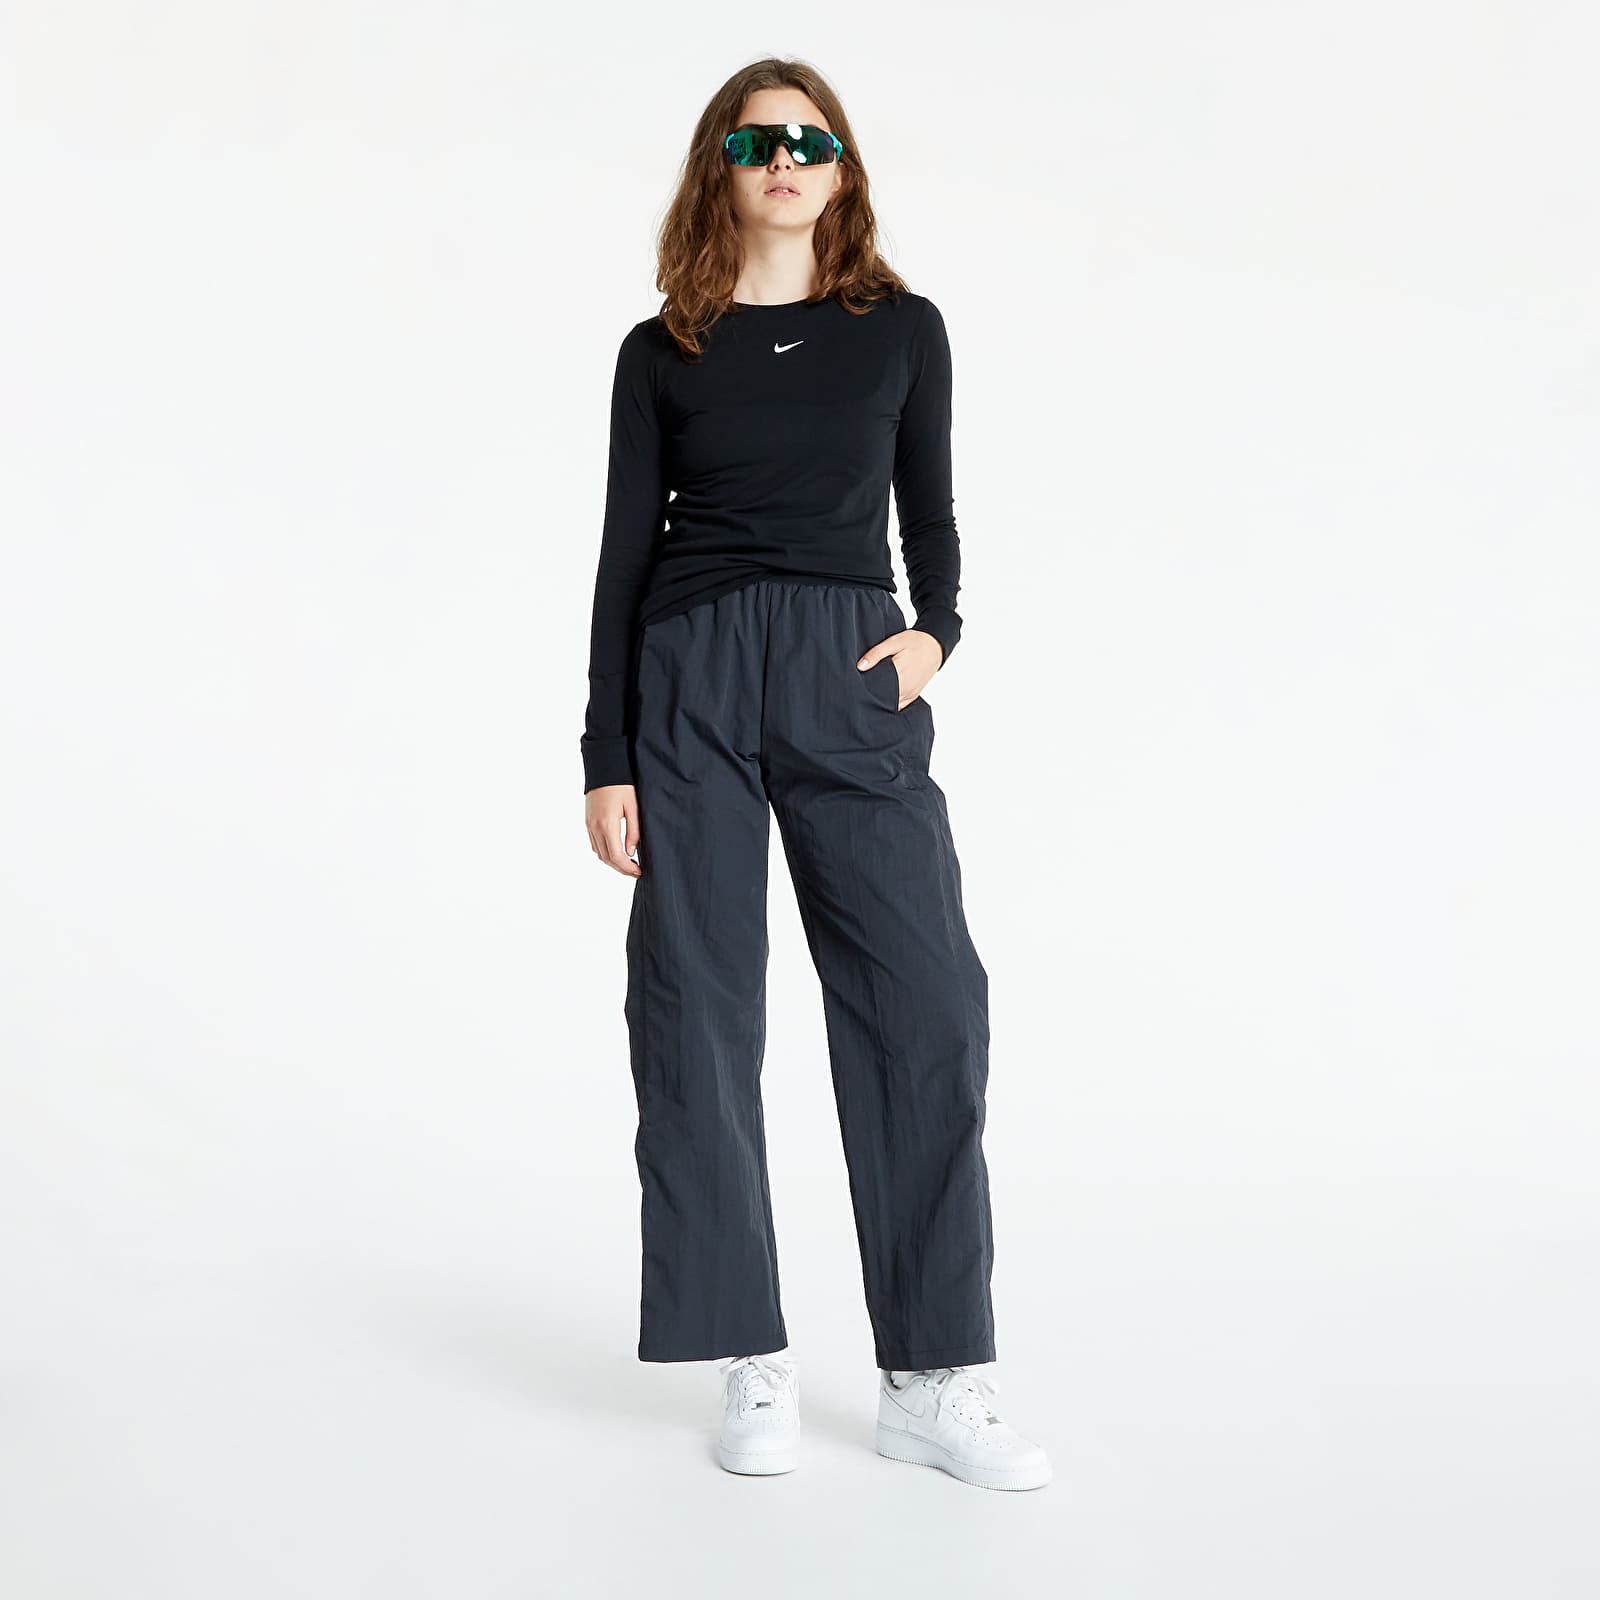 Nike Sportswear Essential Lbr Longsleeve Tee Black/ White EUR S